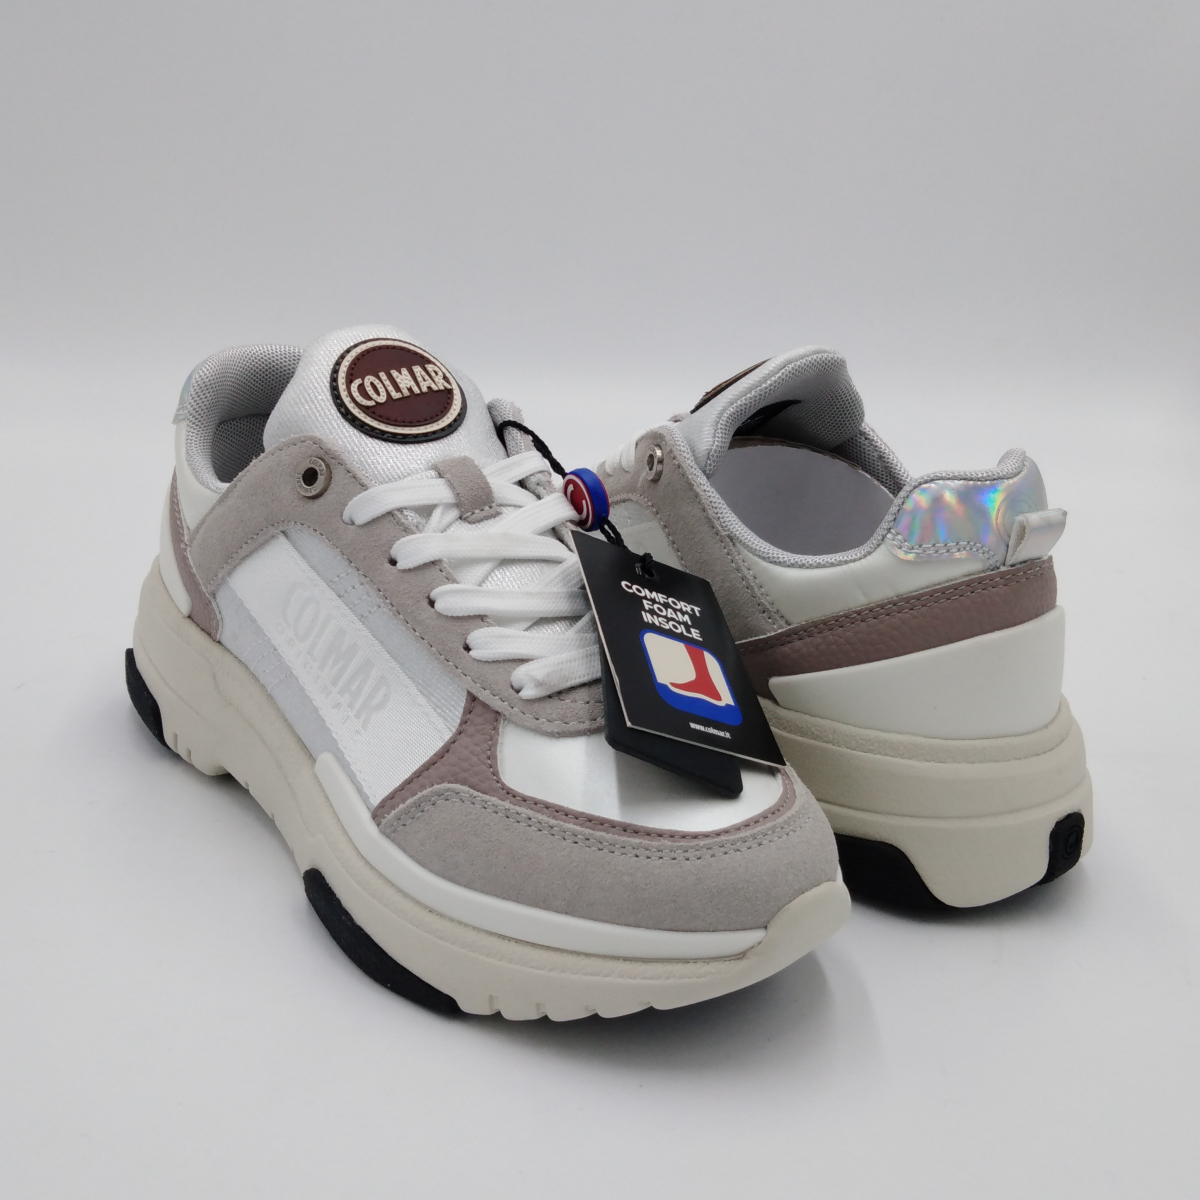 Colmar -Sneaker Donna...